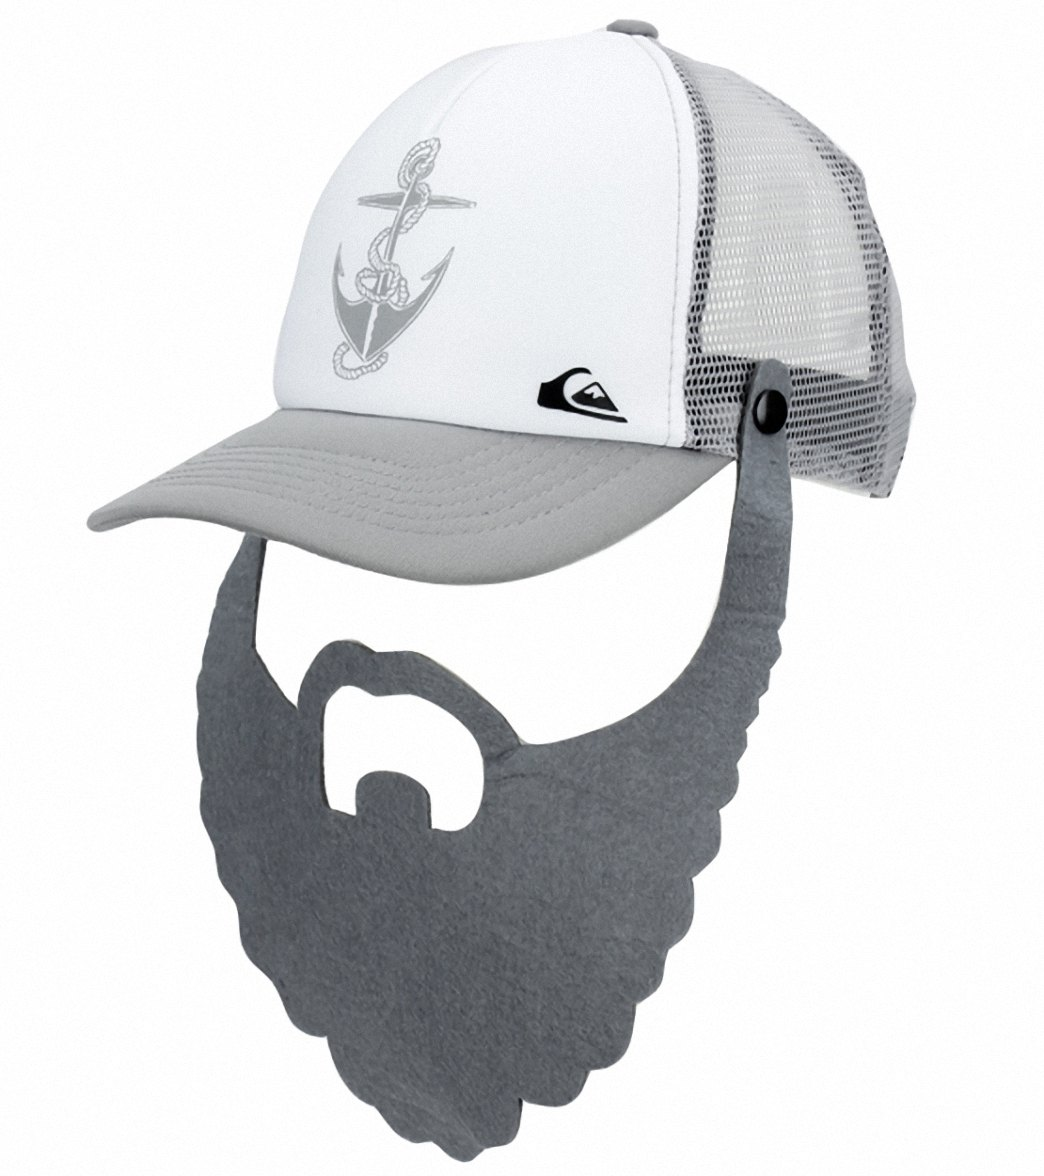 Quiksilver Boys  Diggler Trucker Hat (Kids) at SwimOutlet.com fc959f3fa62e